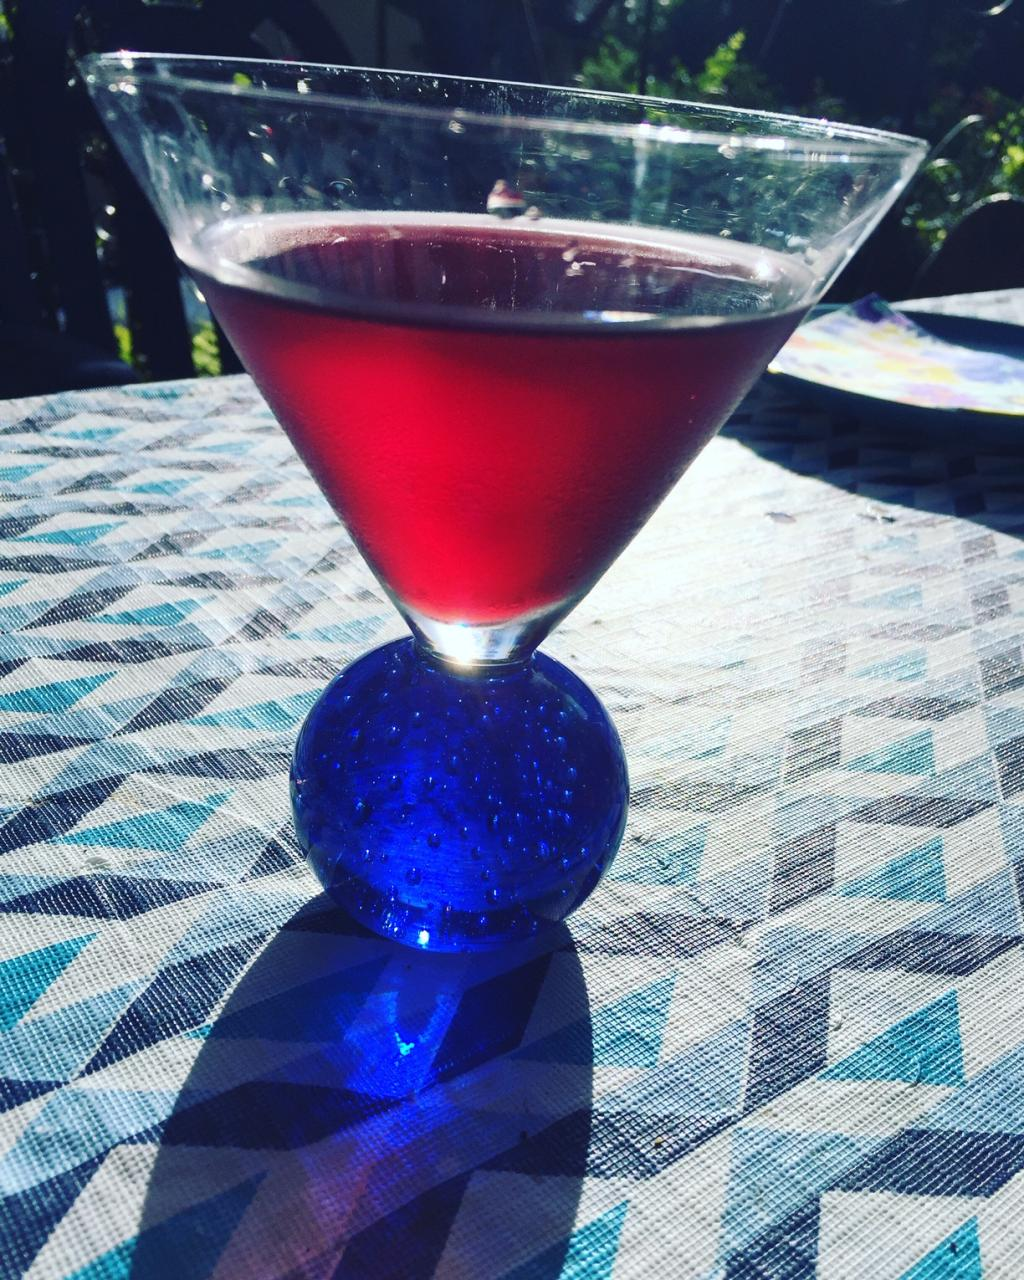 The Cass-tini: the Pomegranate Martini to Celebrate Special Birthdays